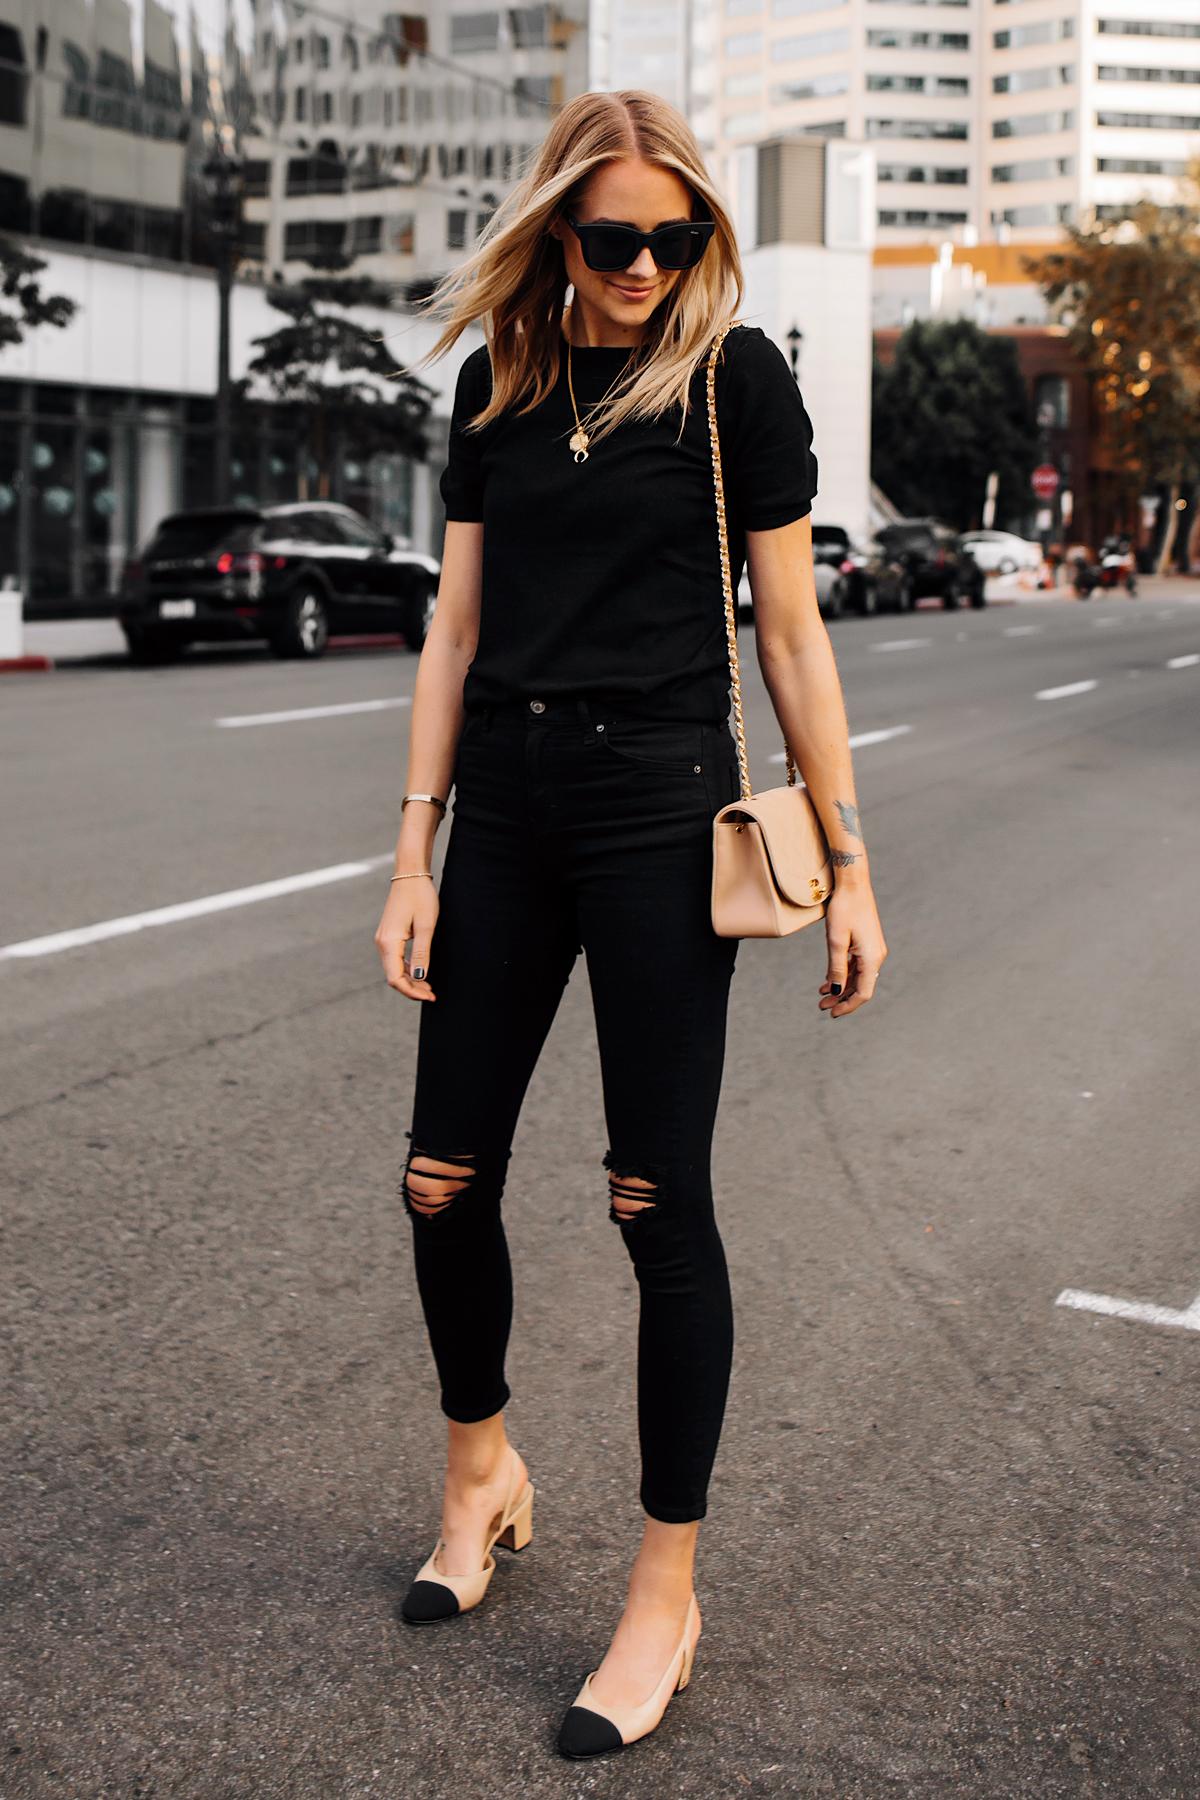 Blonde Woman Wearing Black Short Sleeve Top Black Ripped Skinny Jeans Chanel Diana Tan Handbag Chanel Slingback Shoes Fashion Jackson San Diego Fashion Blogger Street Style